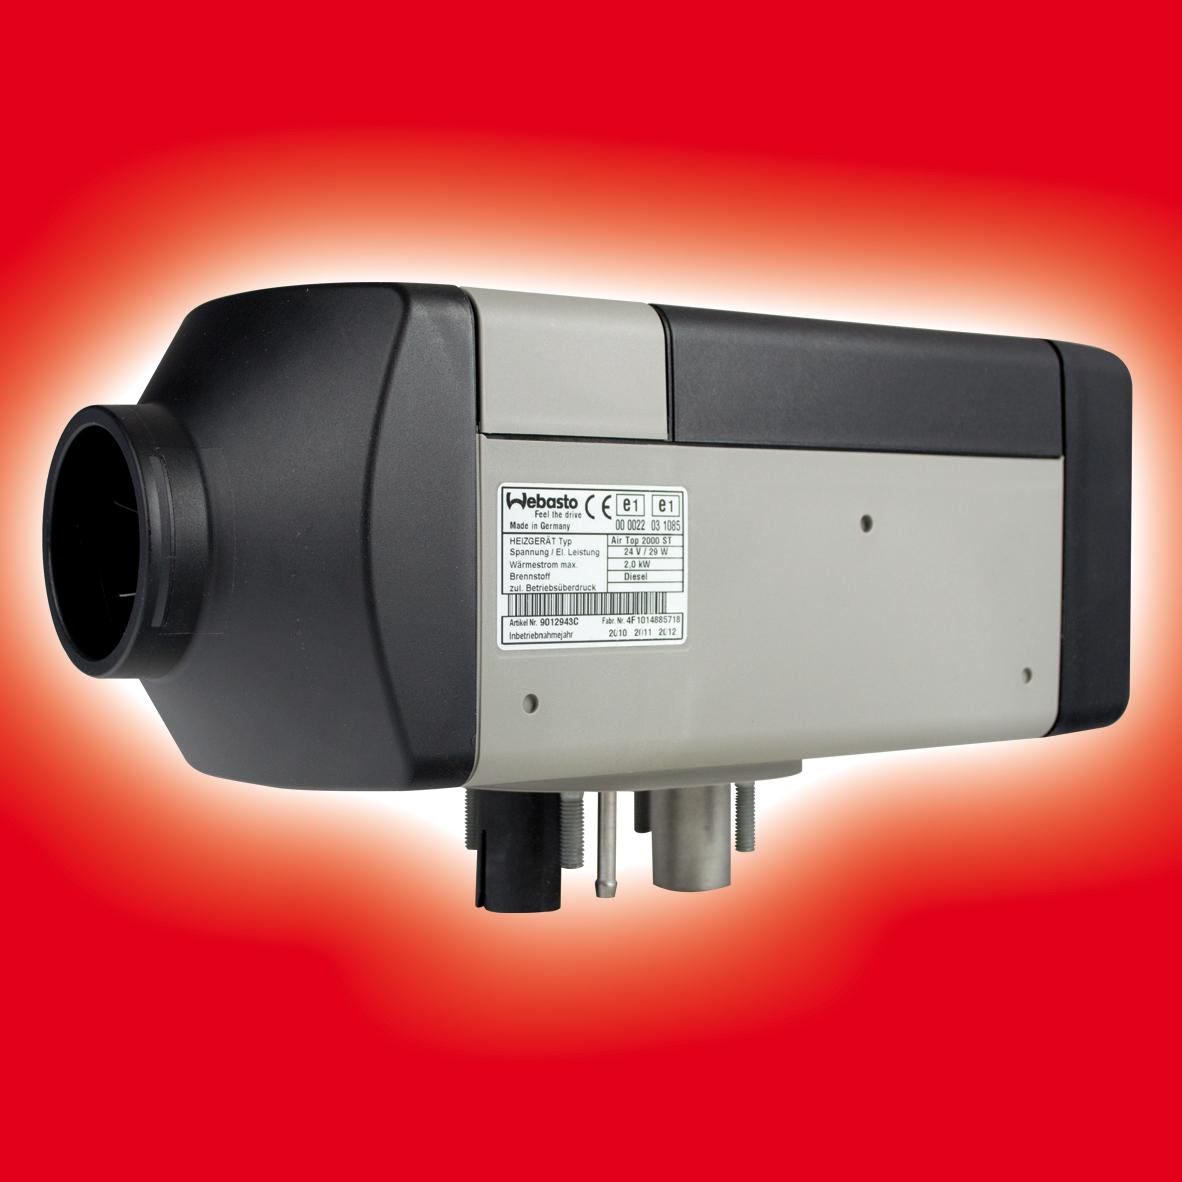 webasto airtop 2000 st 24v heater diesel air heating block. Black Bedroom Furniture Sets. Home Design Ideas